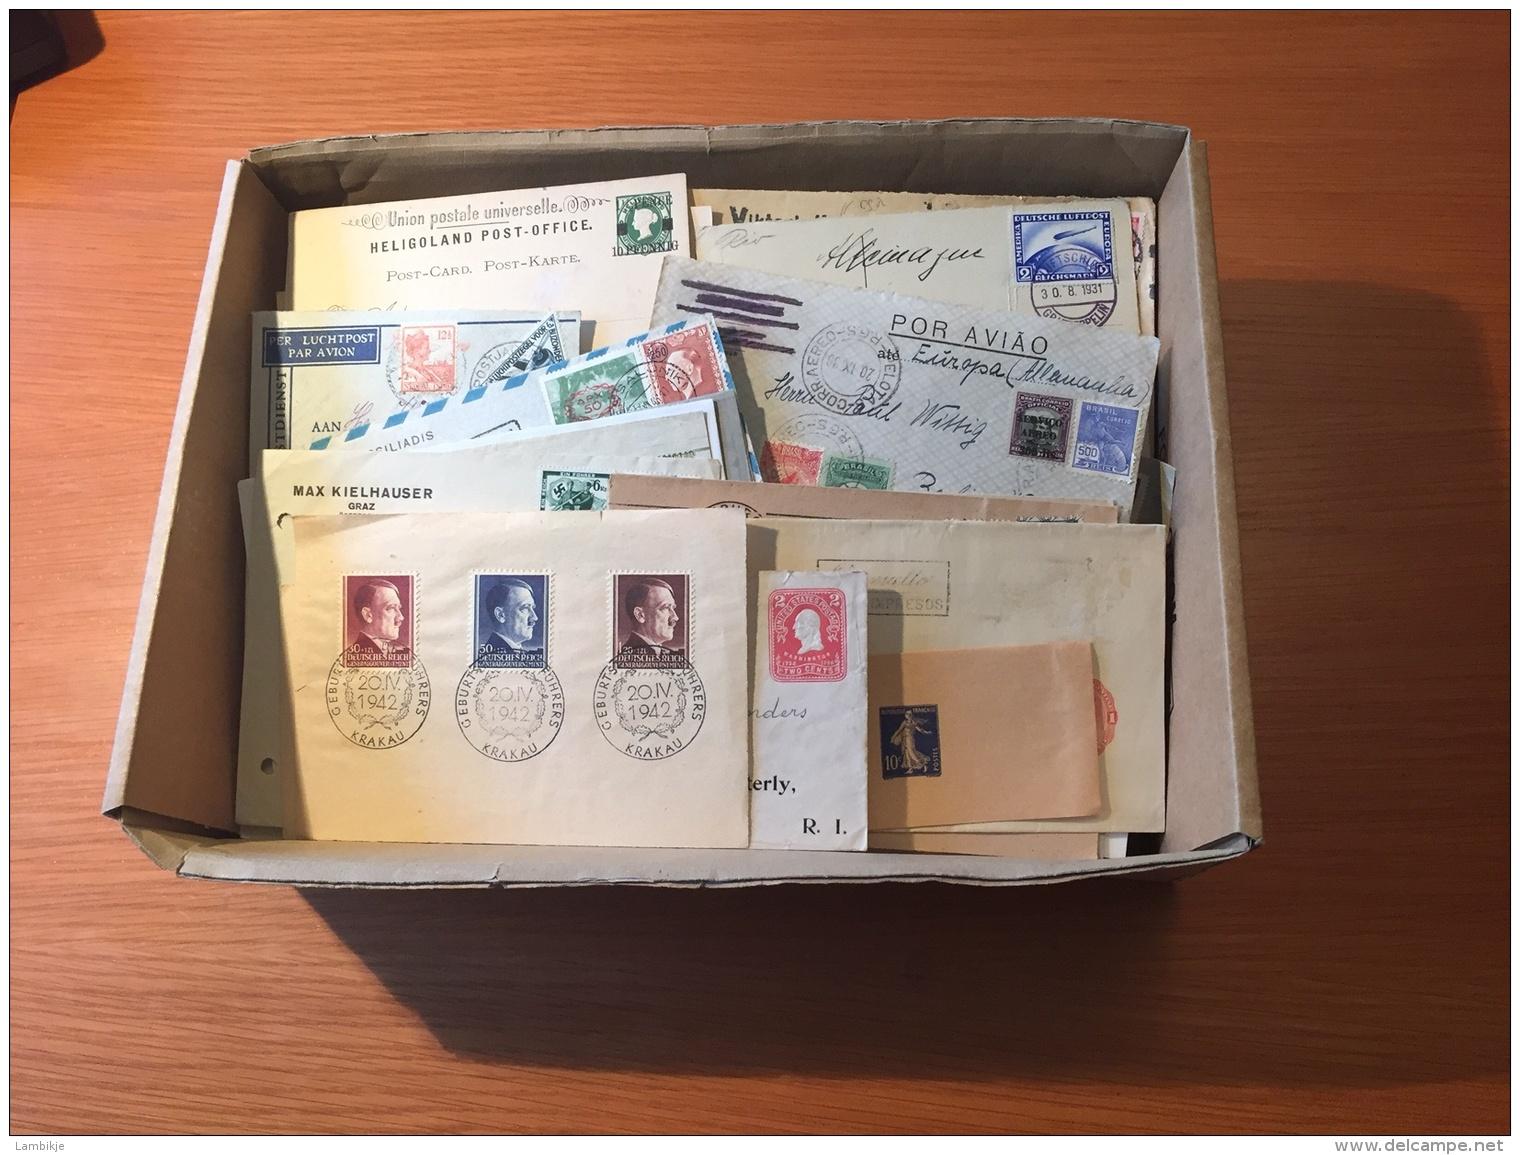 Collection / Sammlung Of 300+ Postcards/Enveloppes/Perfins/Censor World (Deutsches Reich, Brazil Usw)(Mixed Quality) - Postzegels